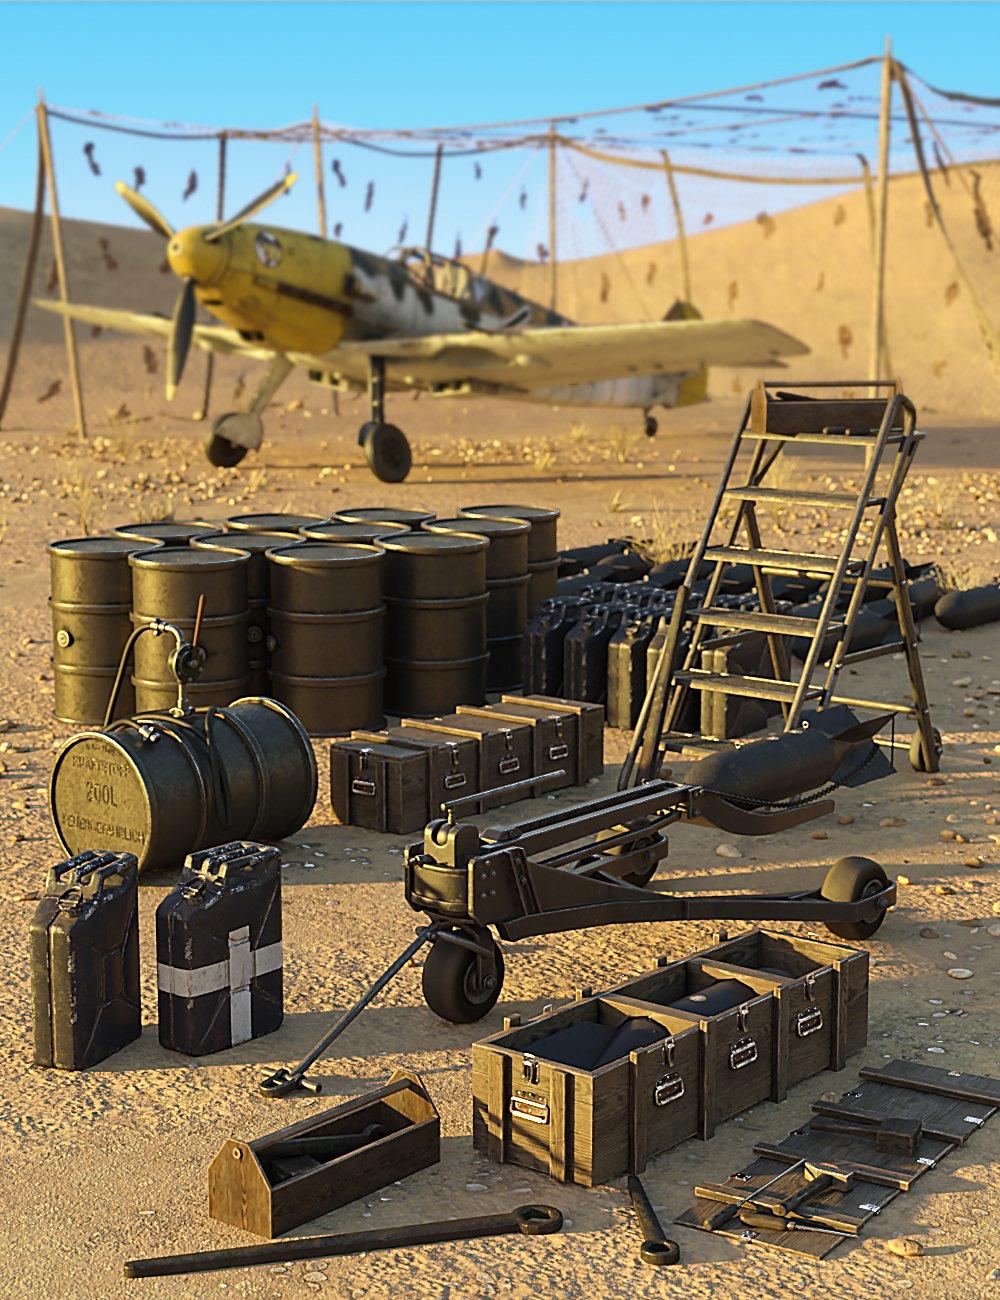 Luftwaffe Ground Support Equipment by: Predatron, 3D Models by Daz 3D